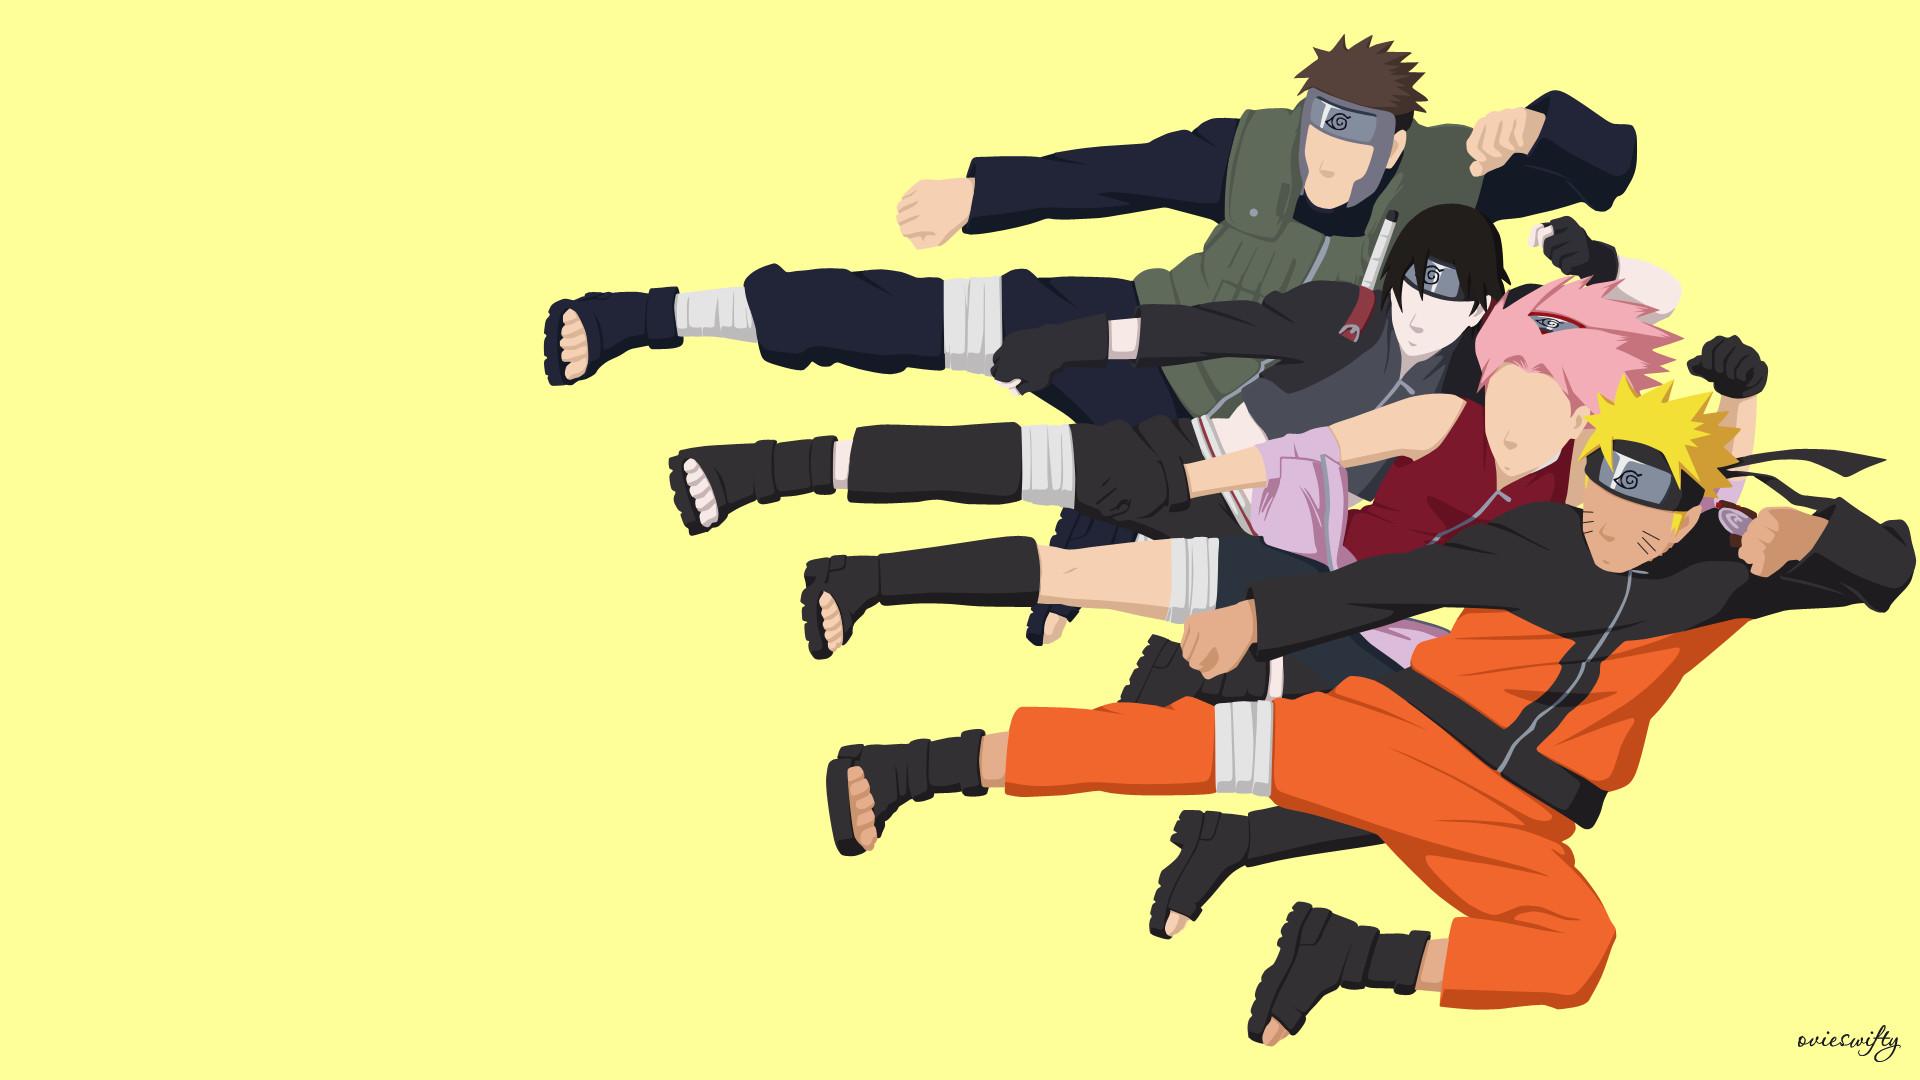 Sakura Haruno Cute Wallpaper Naruto Team 7 Wallpapers 62 Images